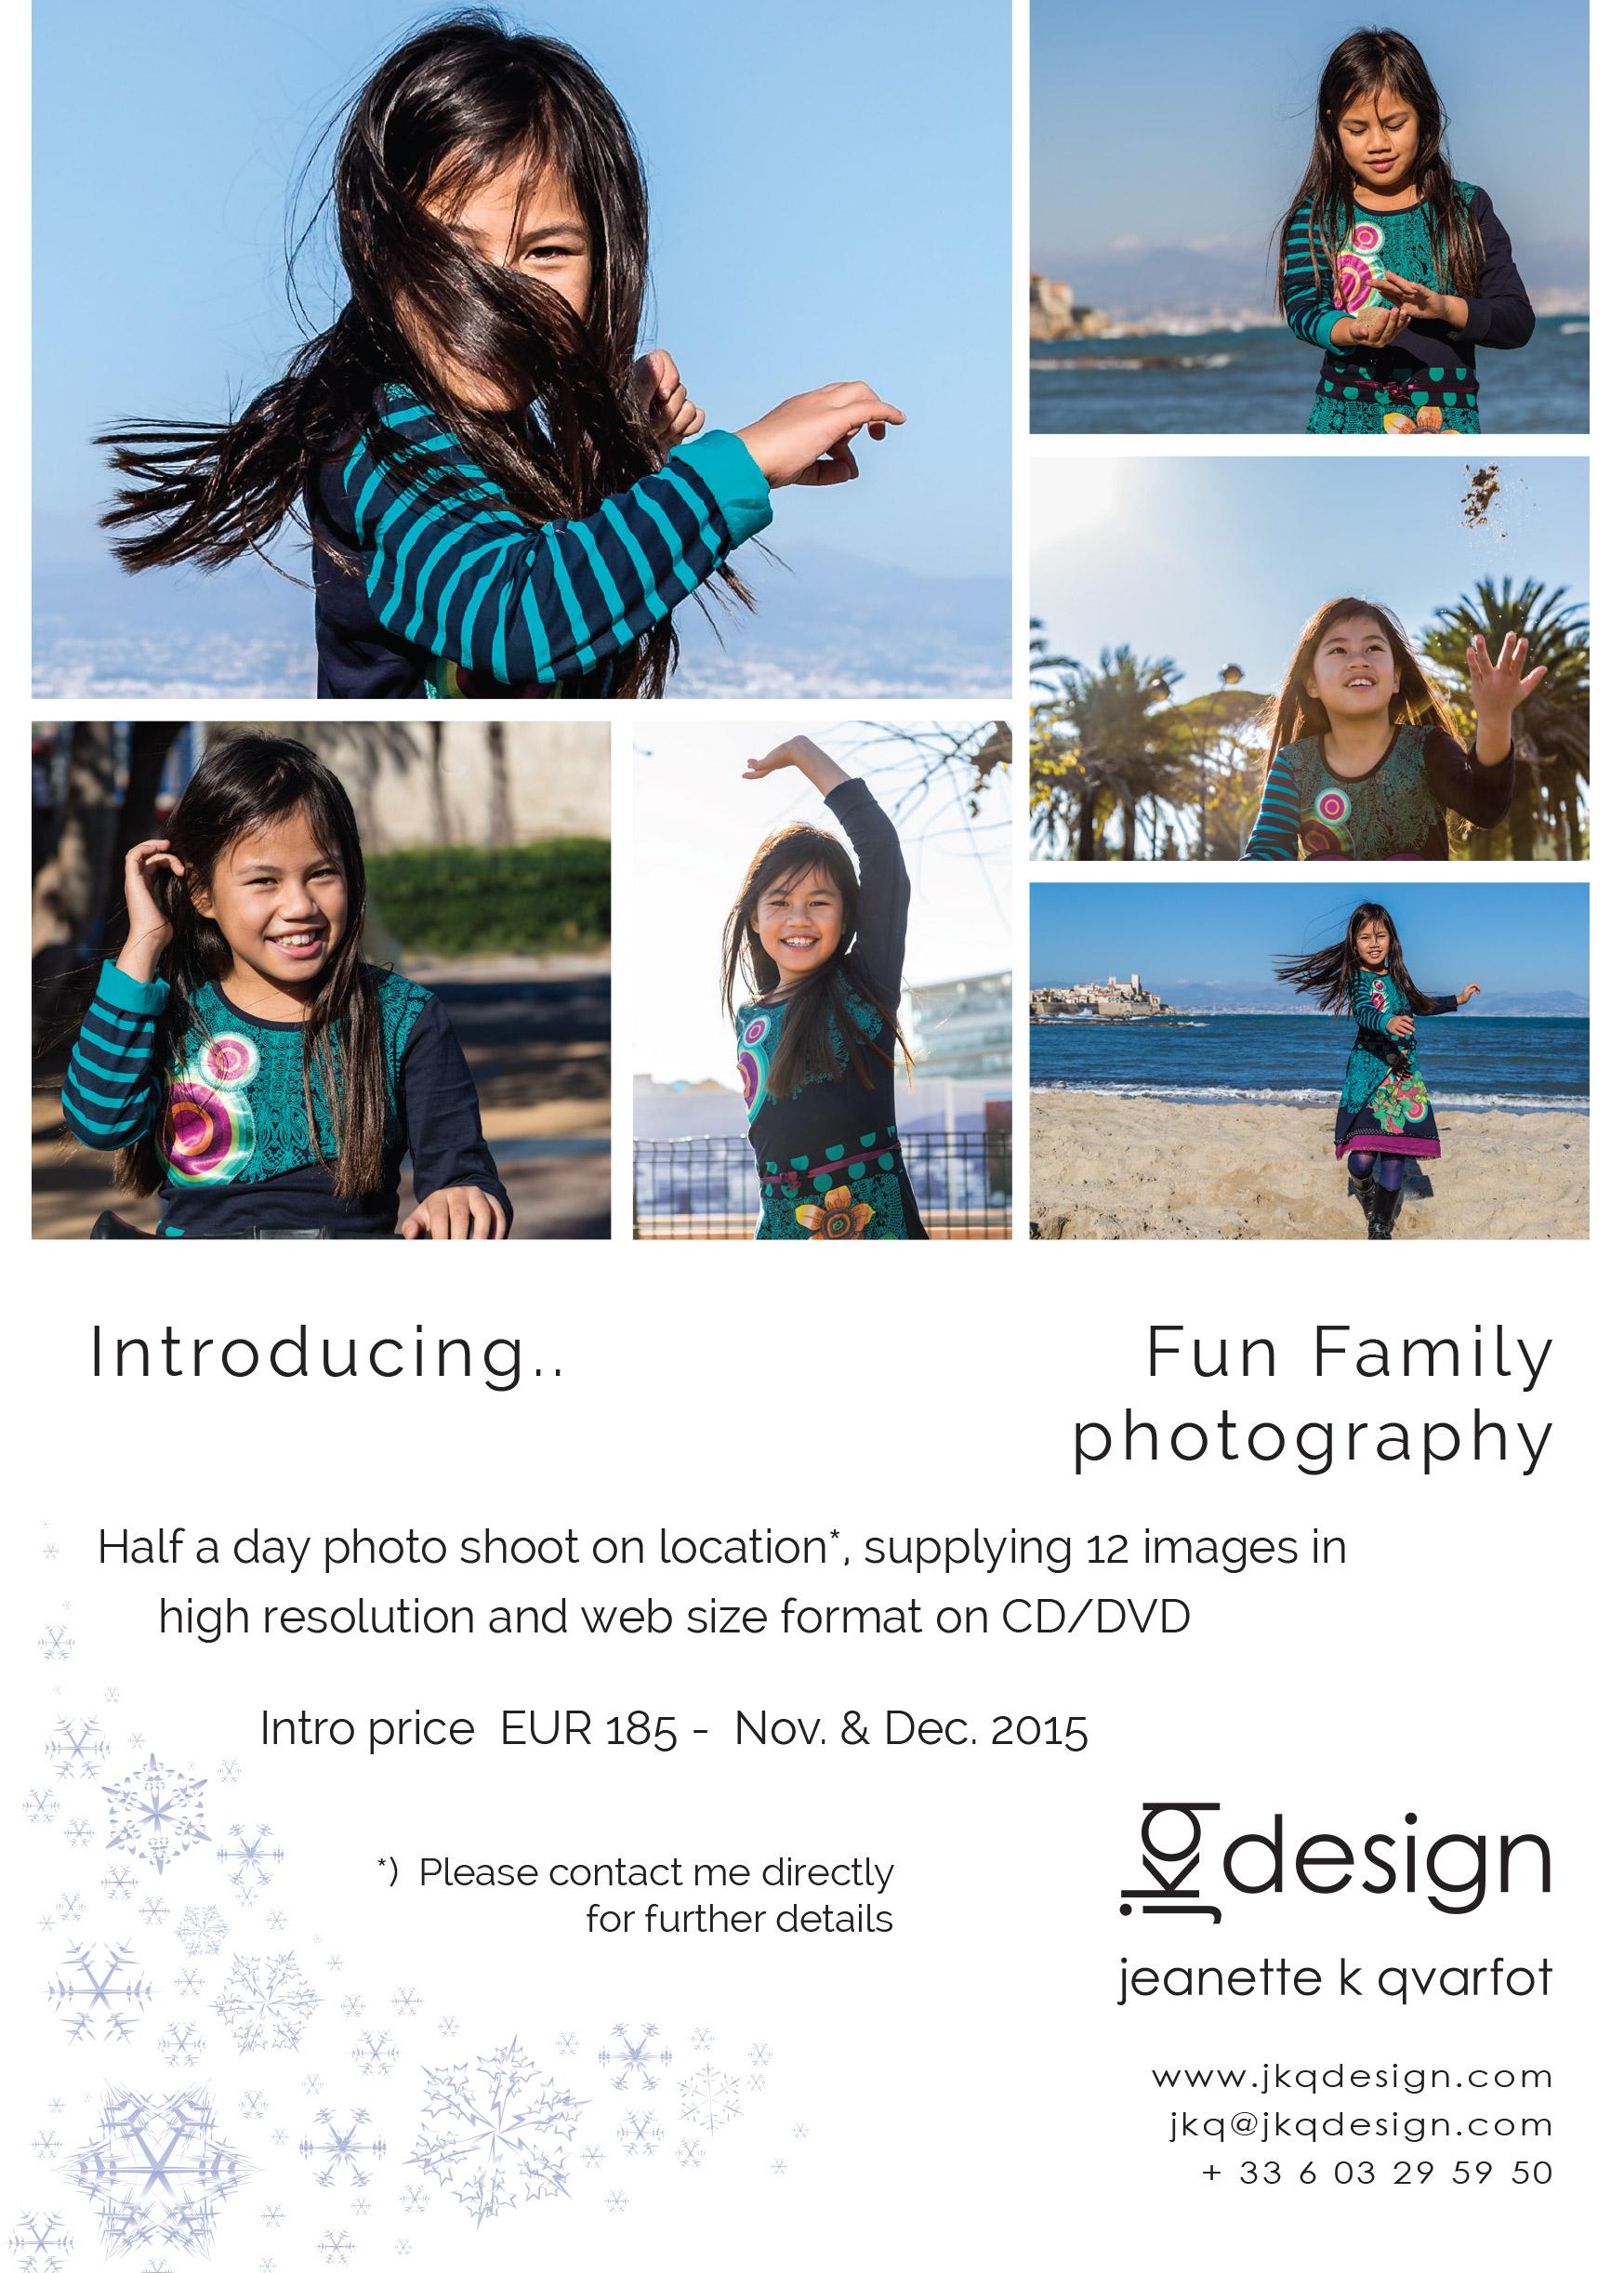 fun-family-photography